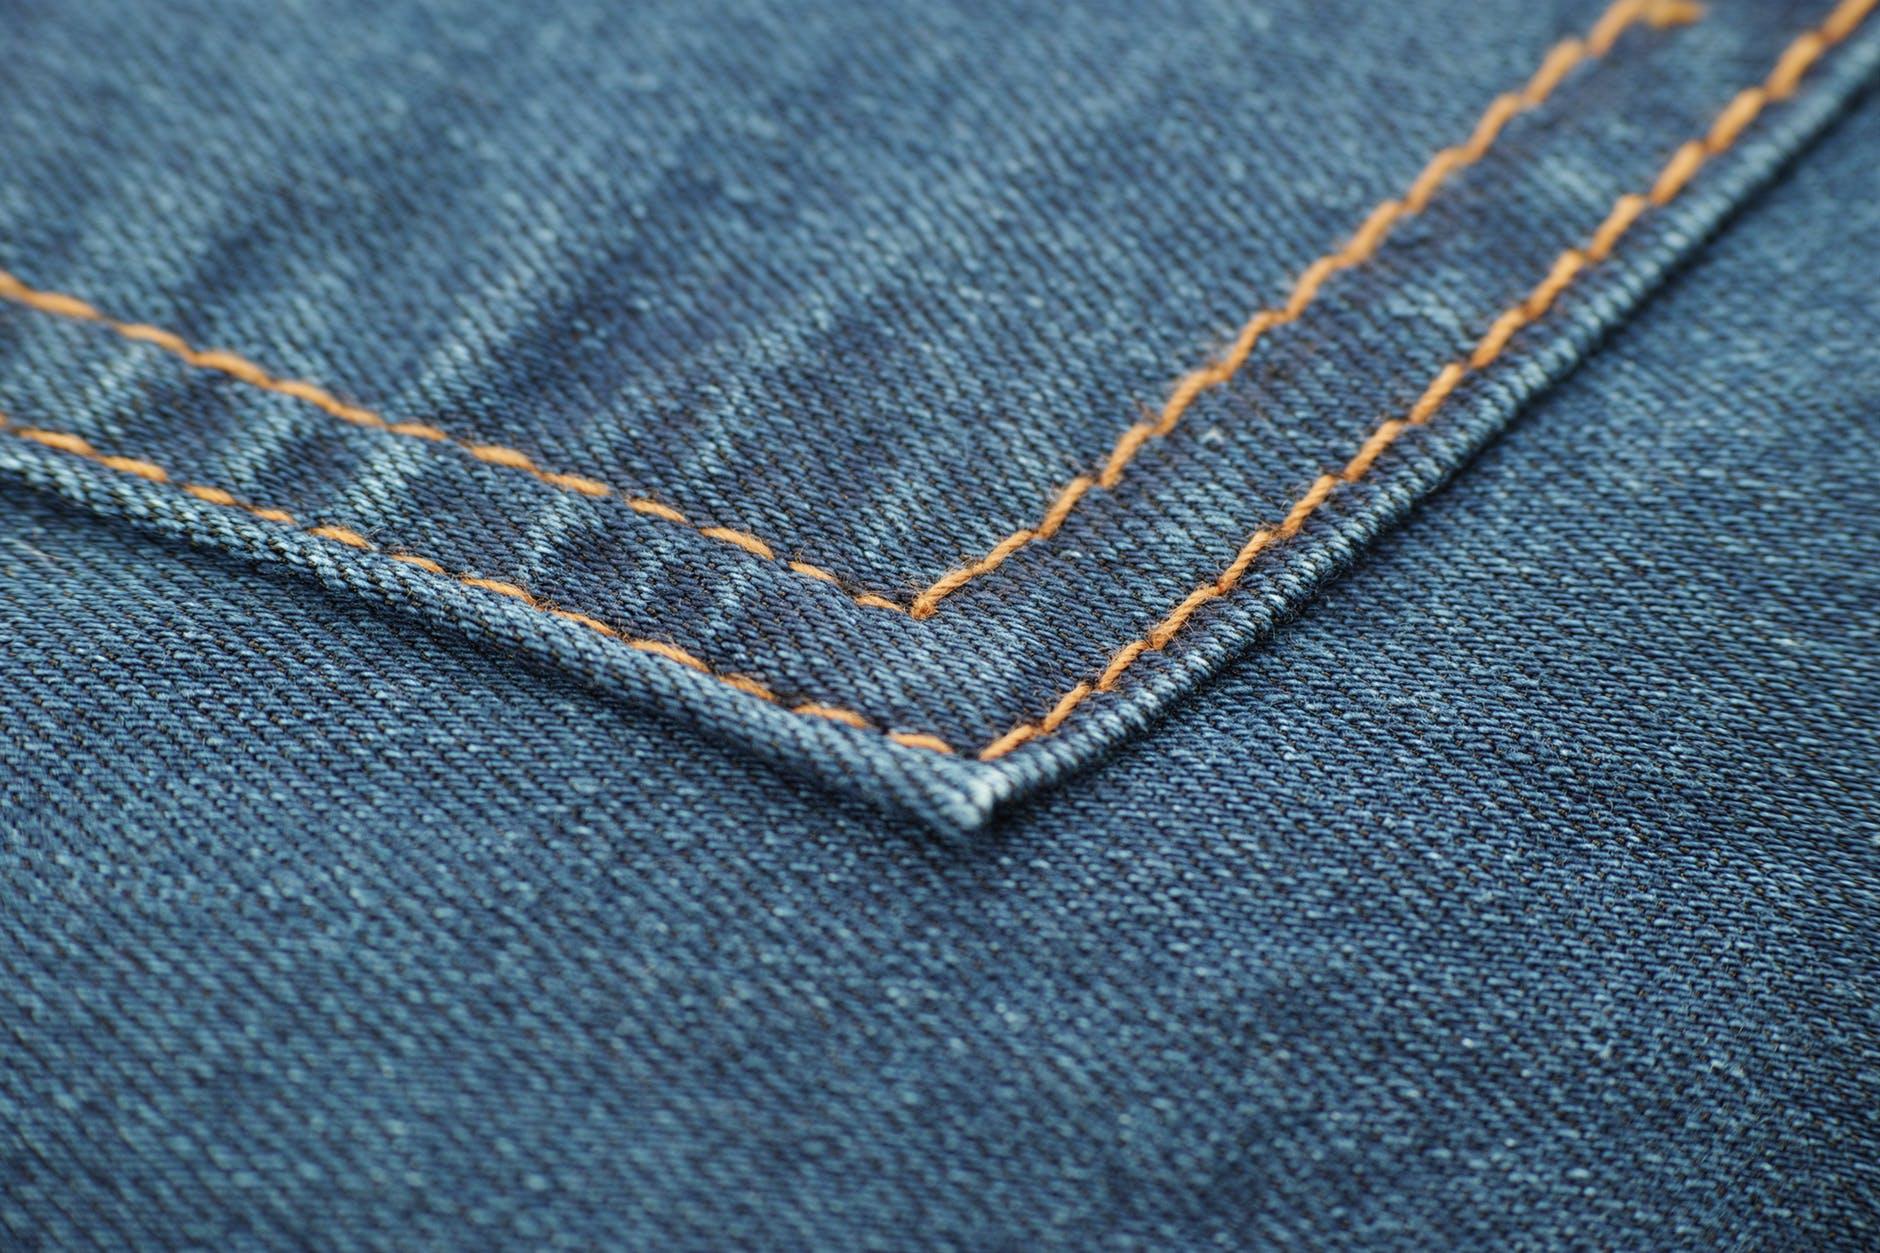 photo of blue denim textile